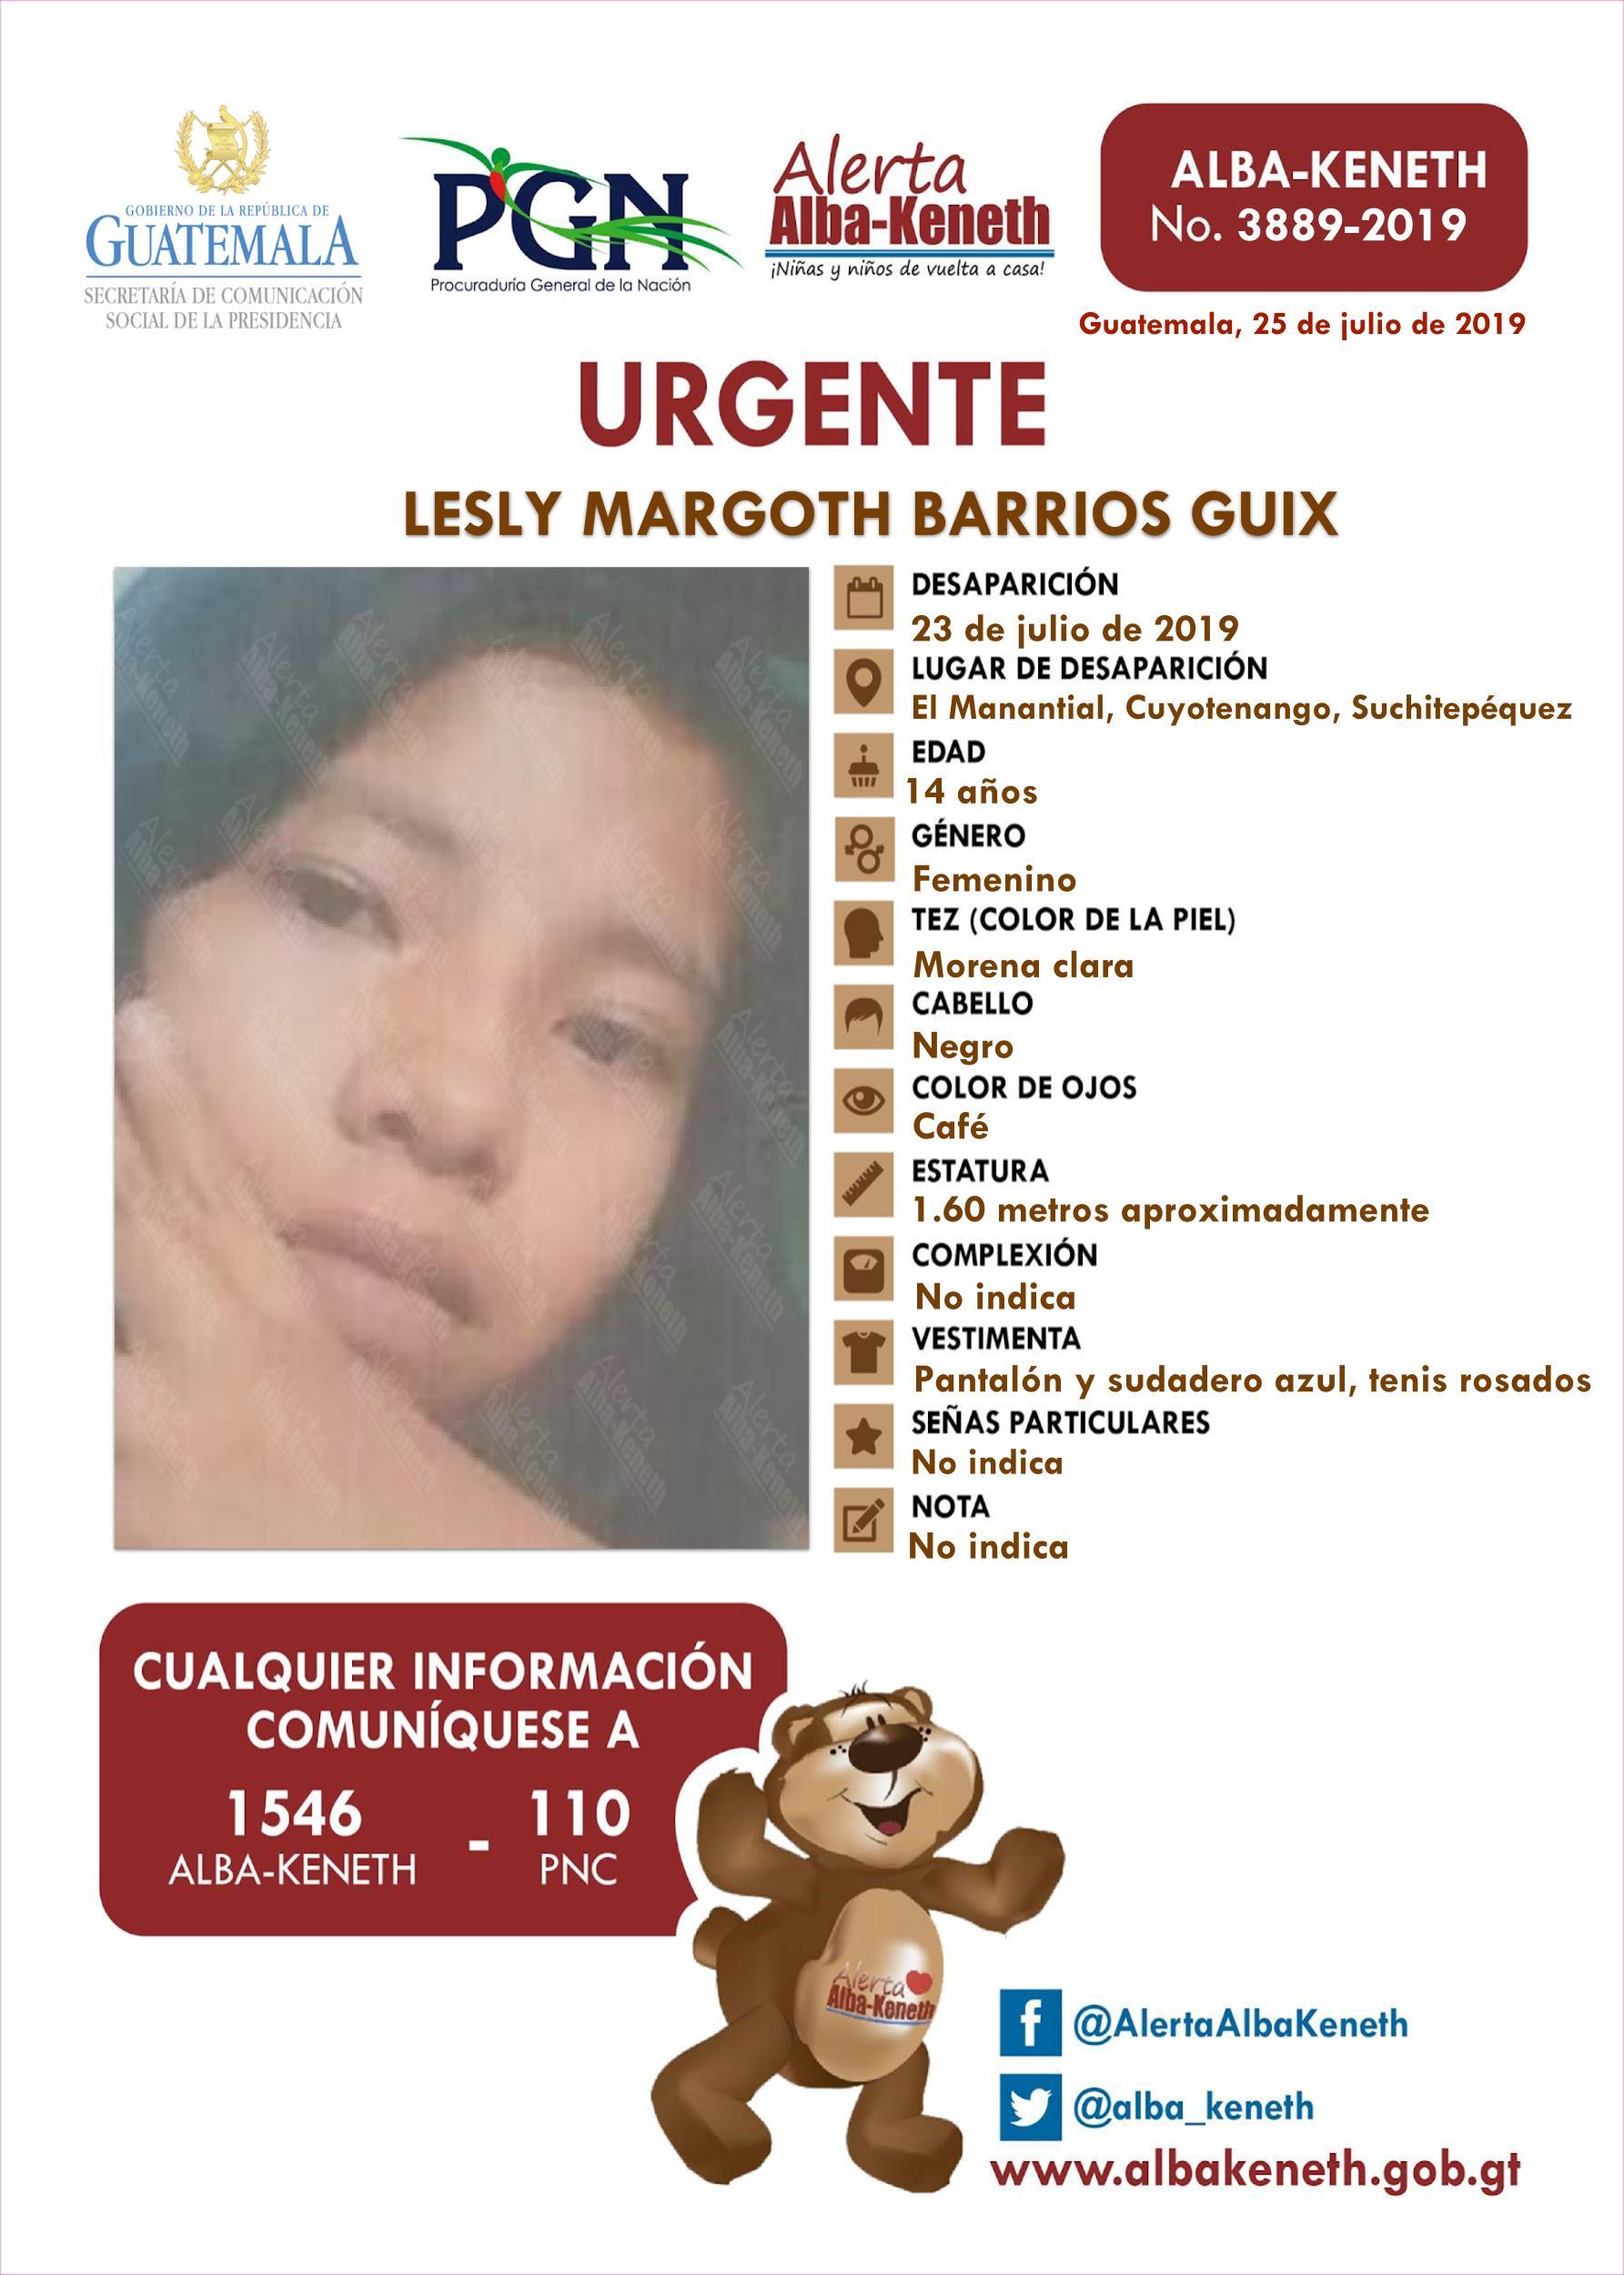 Lesly Margoth Barrios Guix